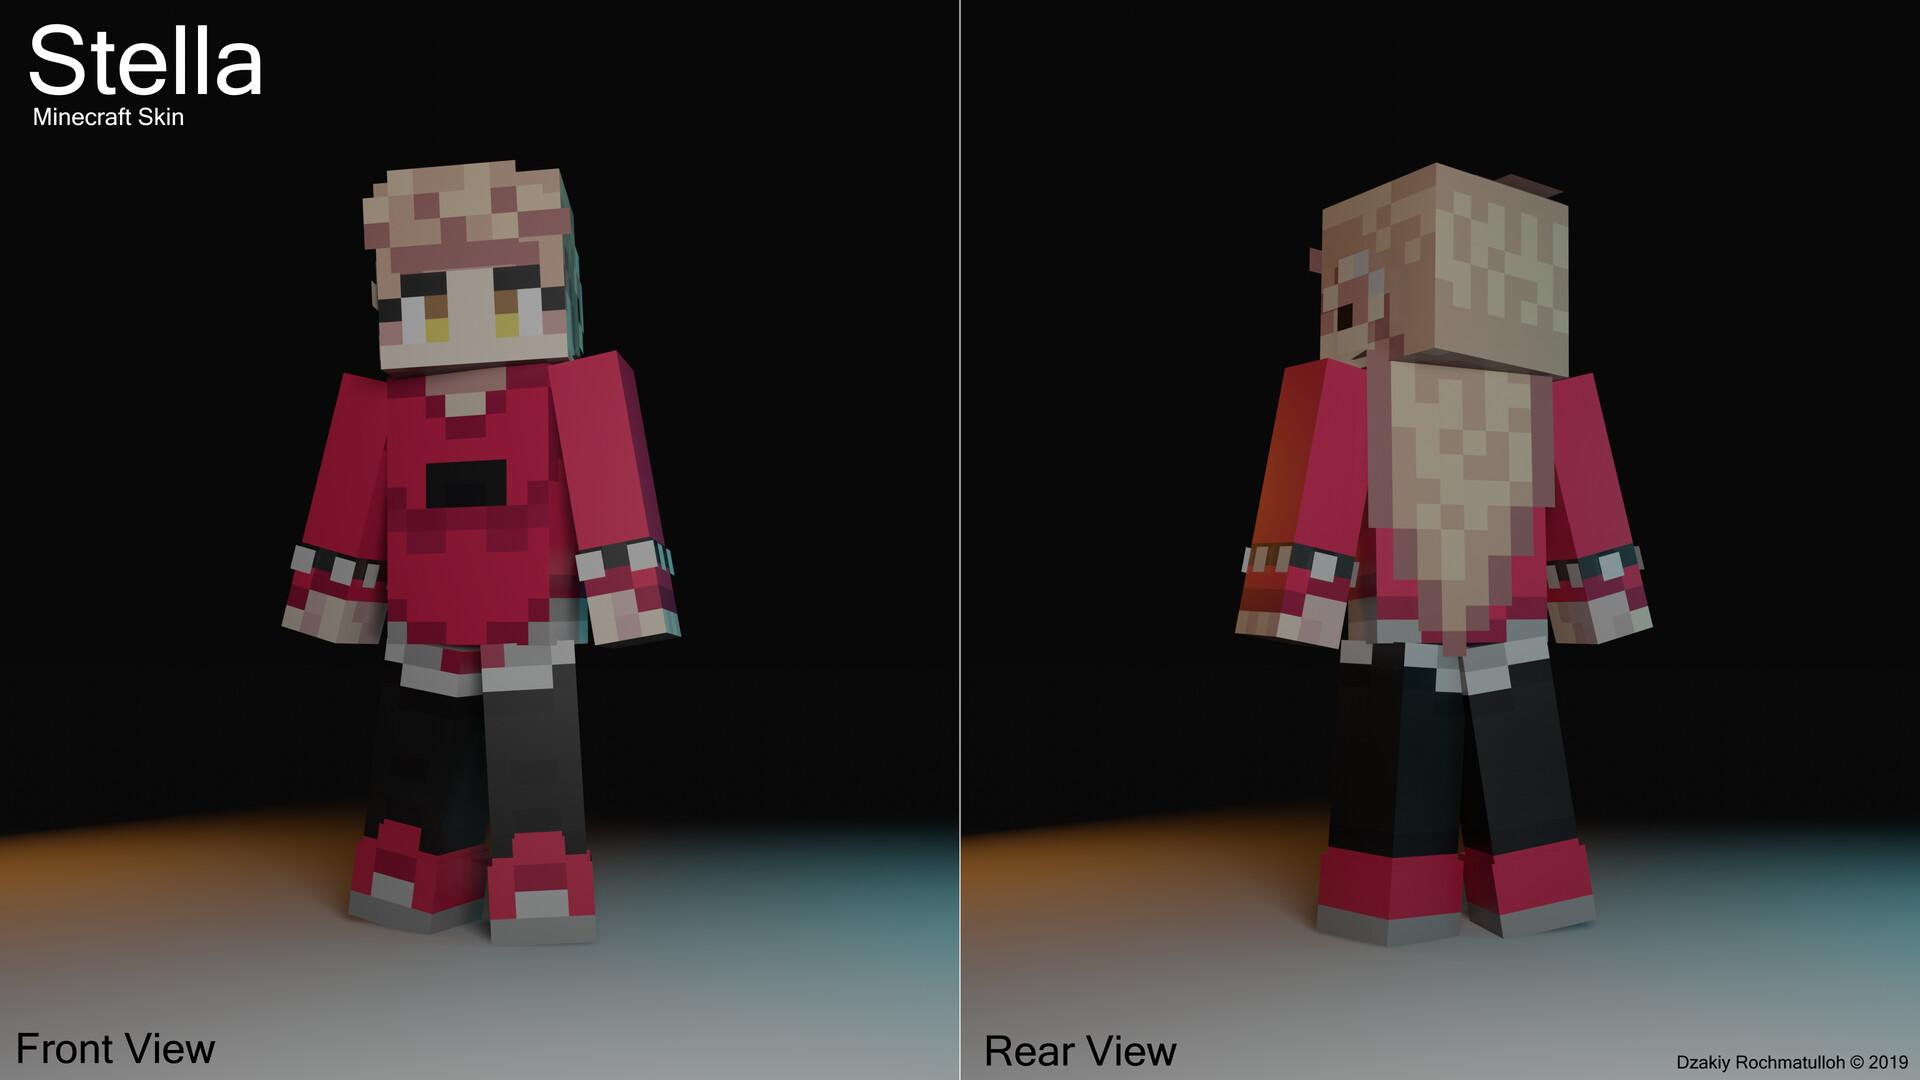 ArtStation   Stella   Minecraft Skin, Dzakiy Rochmatulloh